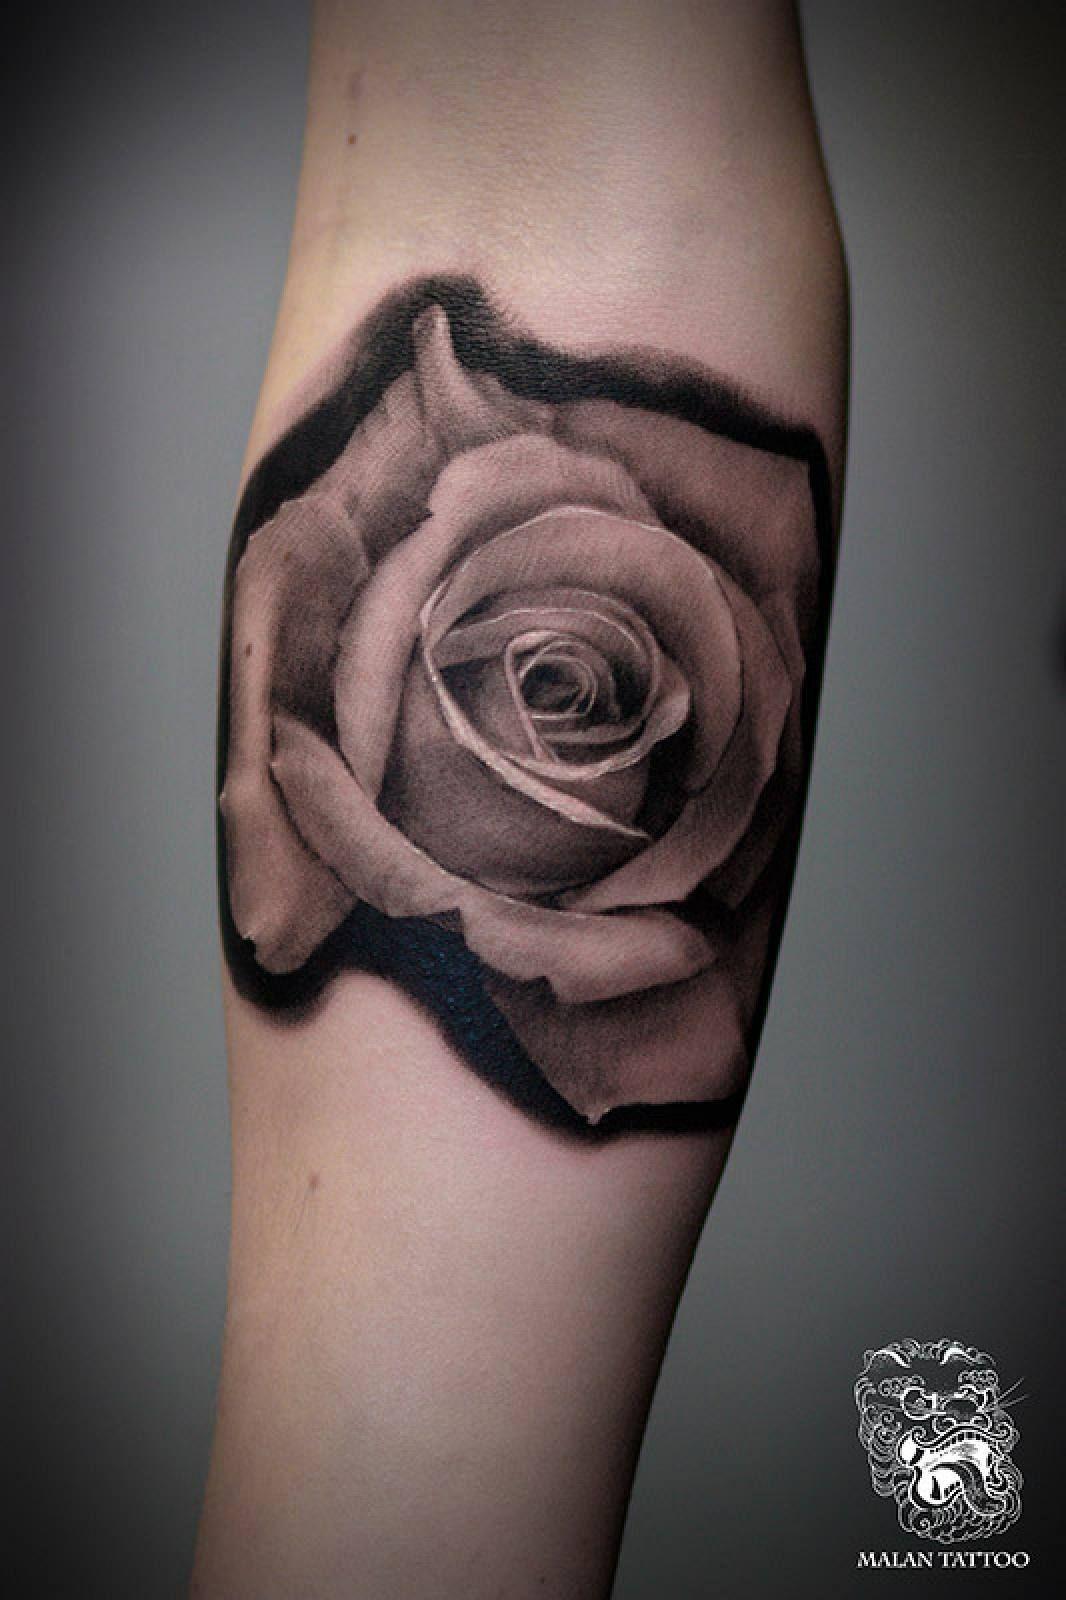 Rose portrait black and grey rose tattoo malan tattoo dublin